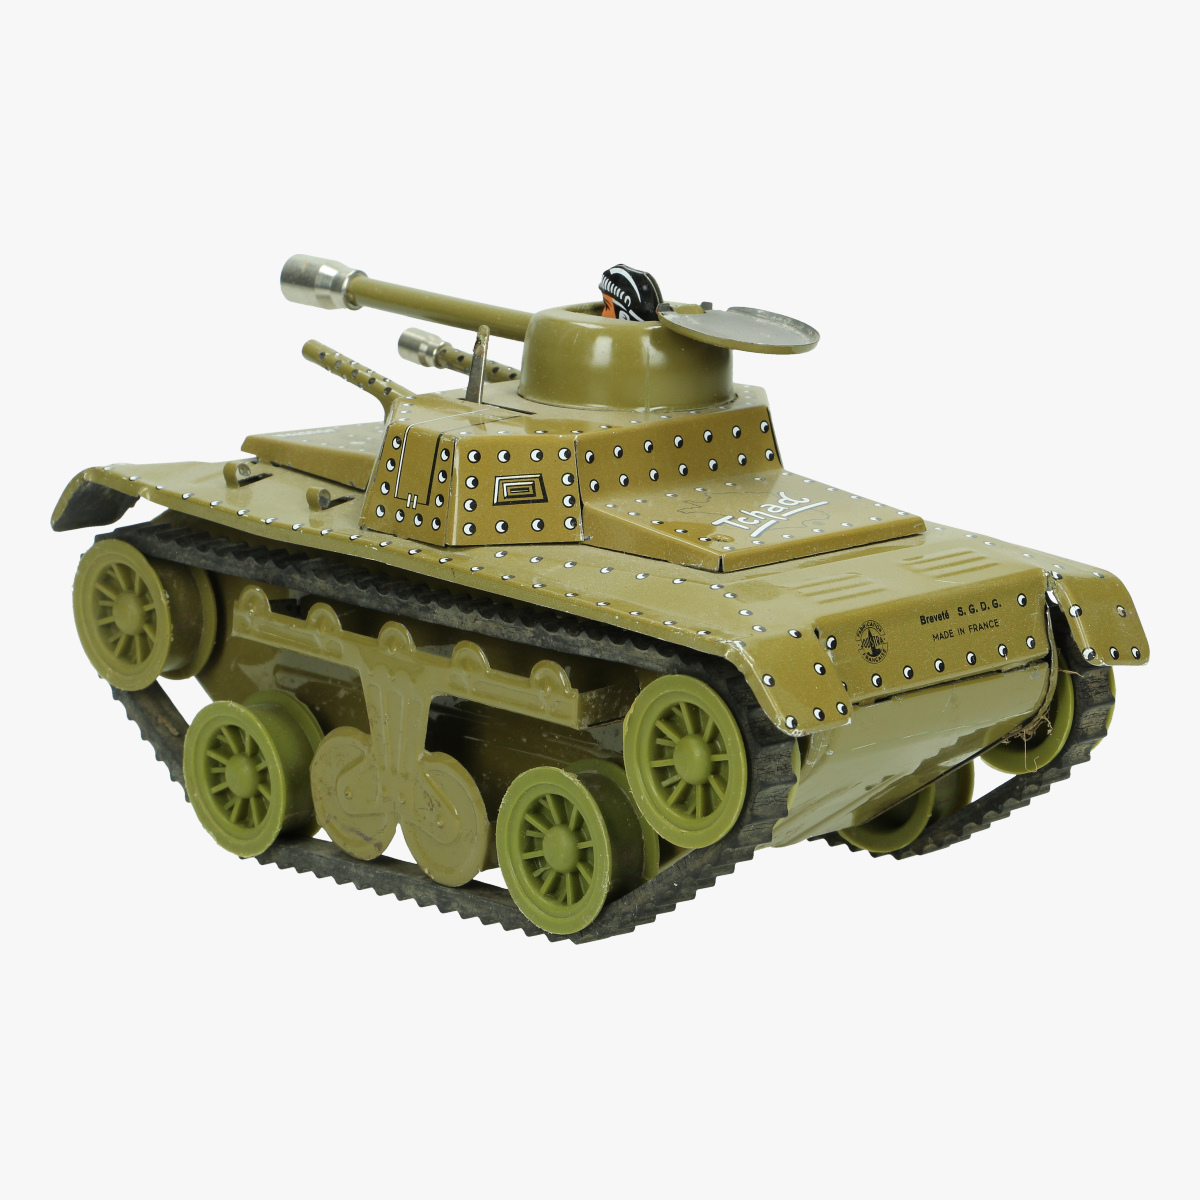 Afbeeldingen van blikken tank tchad brevetté S.G.D.G made in France